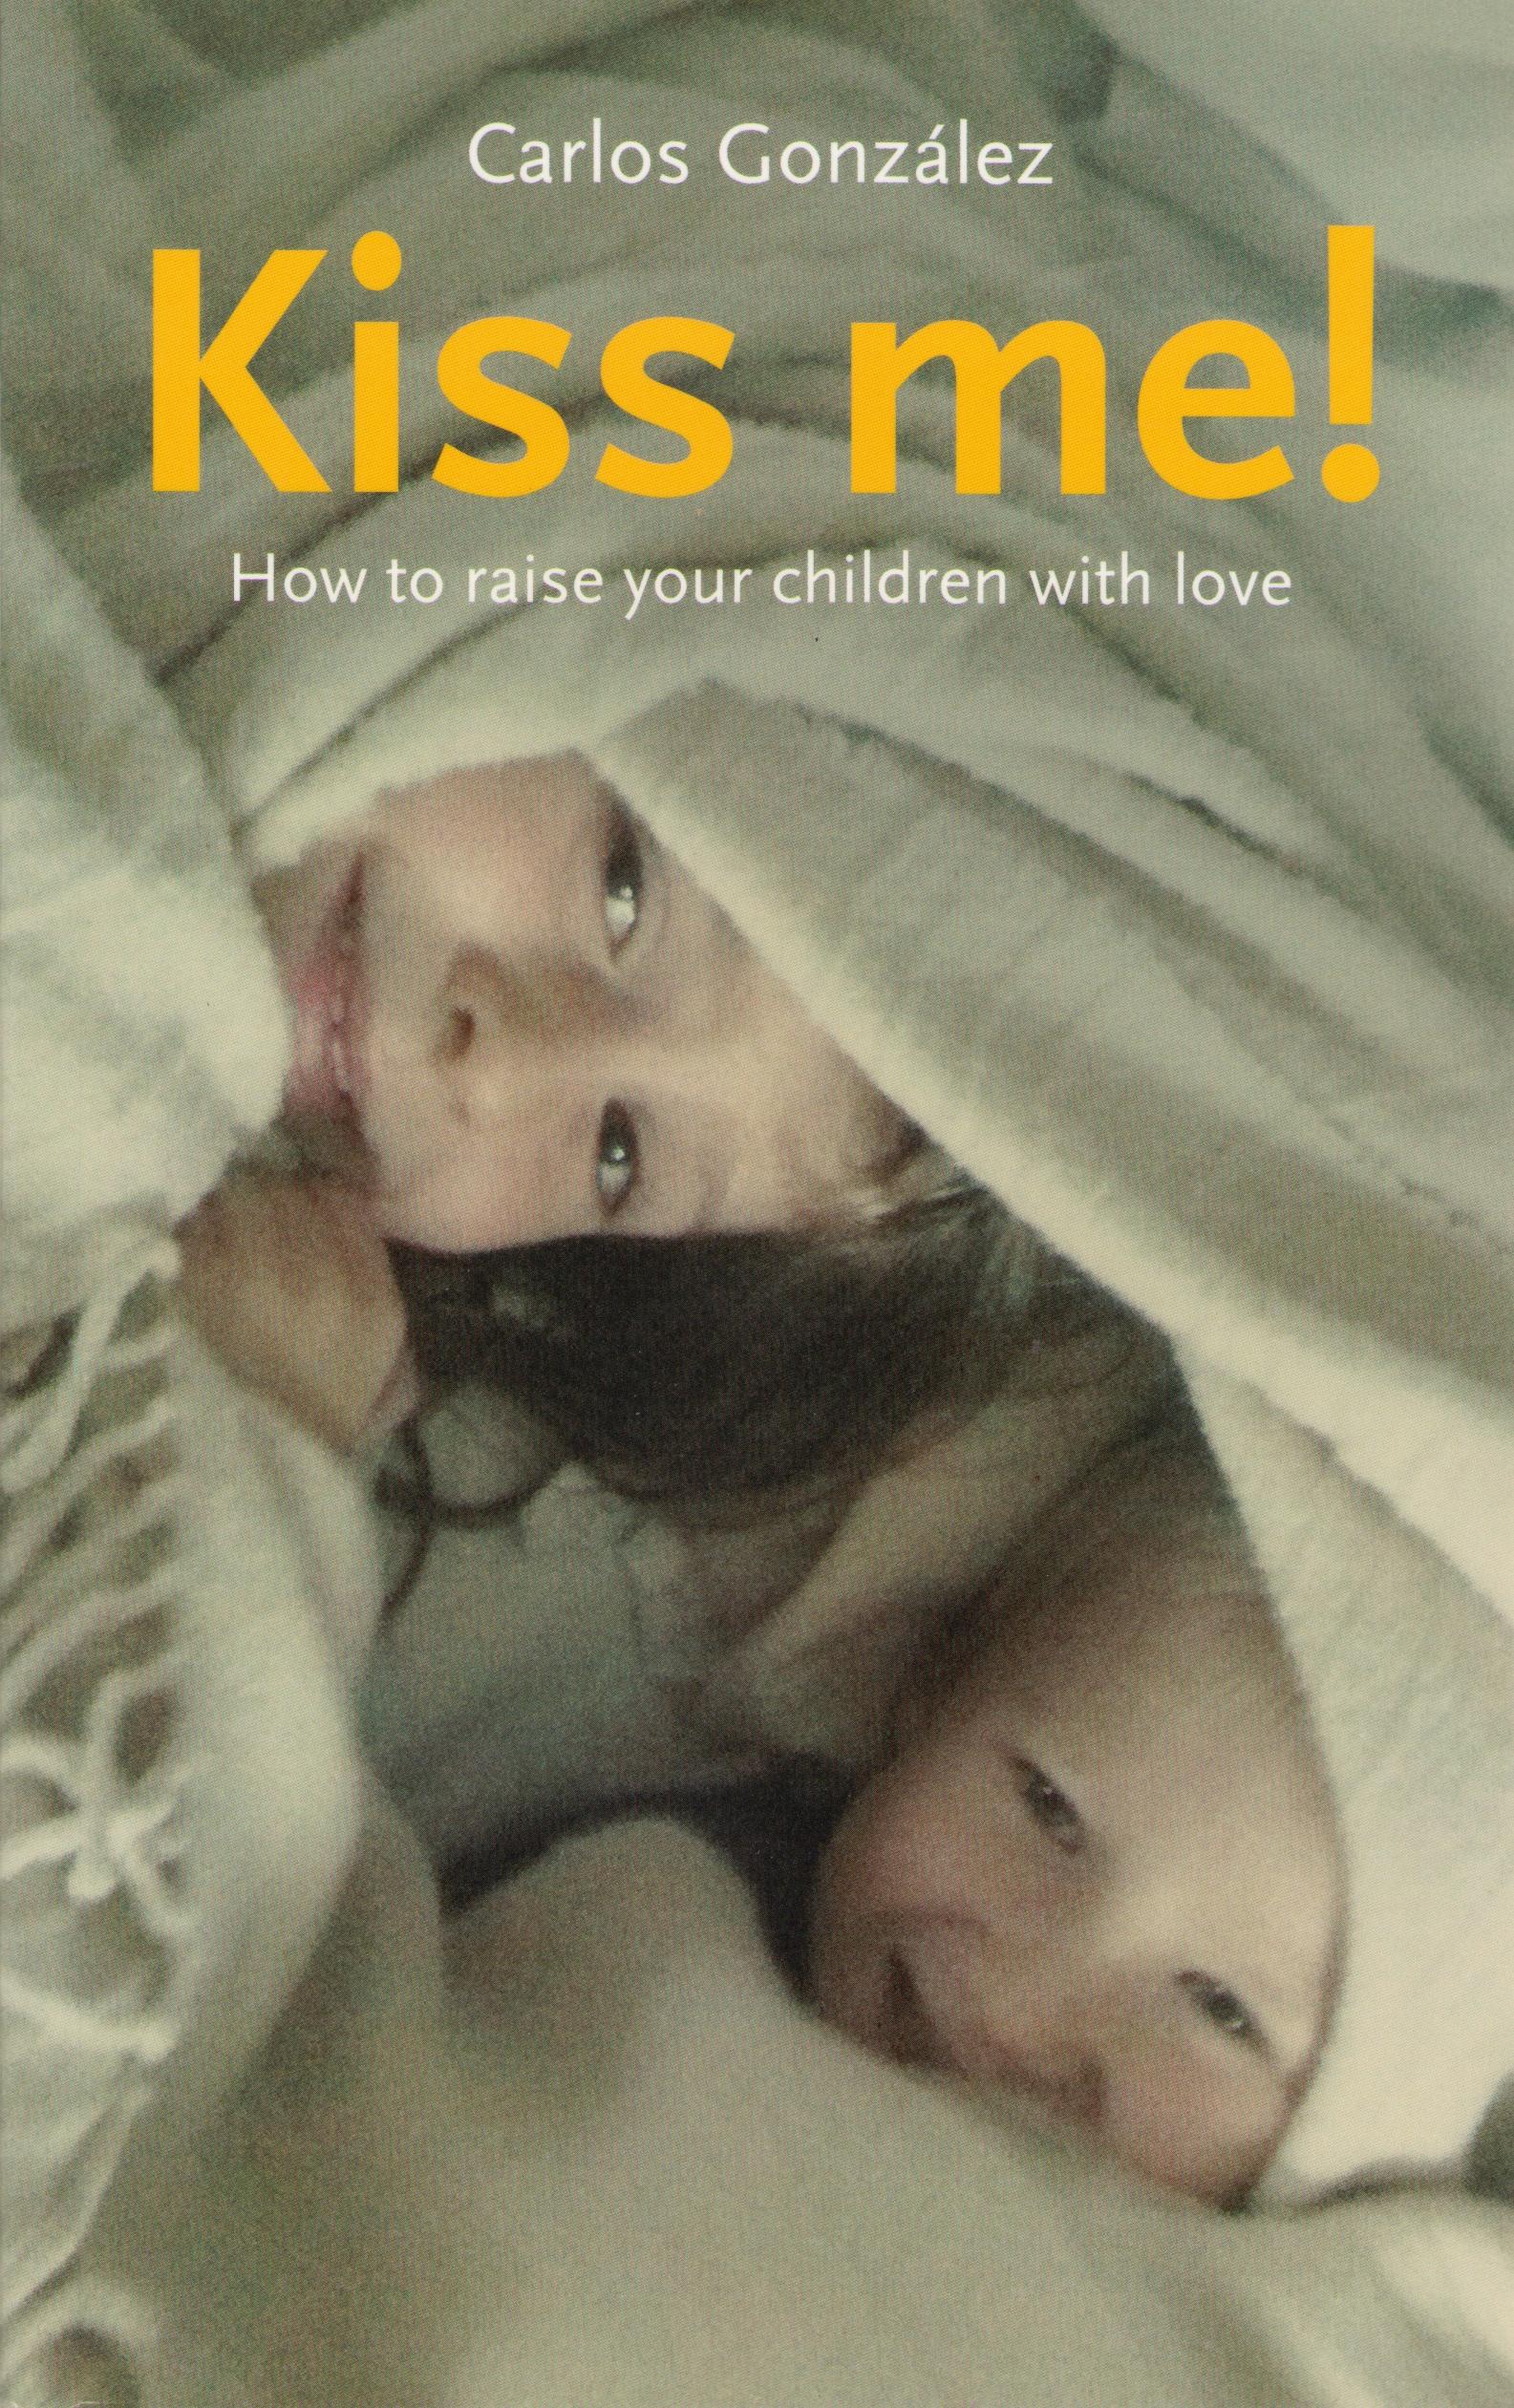 My favourite parenting book for babies! Kiss me, by Carlos Gonzalez | Sacraparental.com